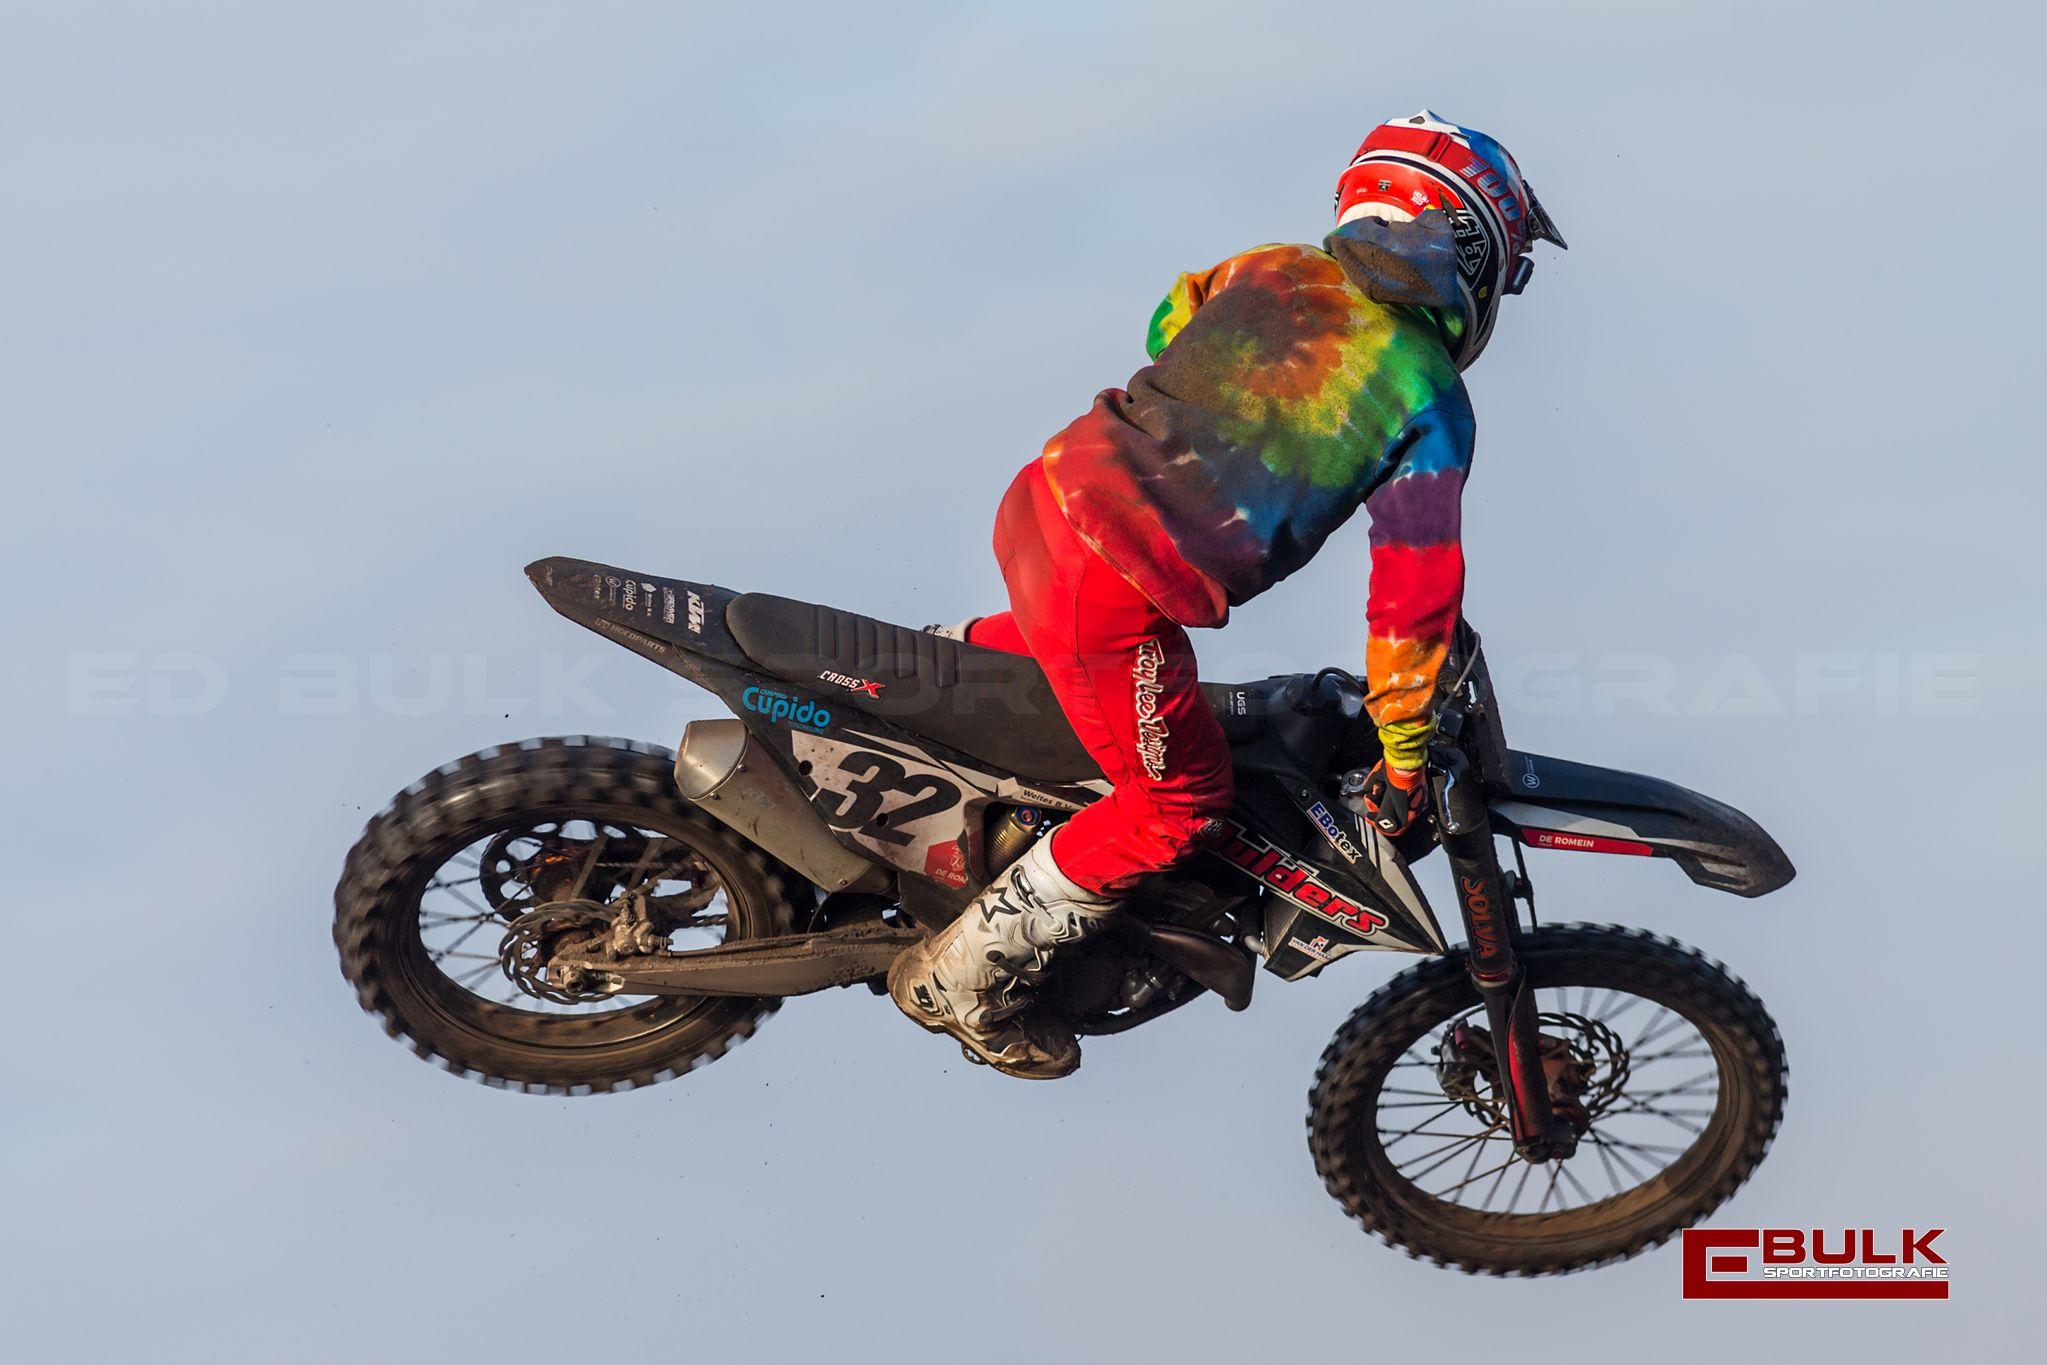 eebs2142-ed_bulk_sportfotografie